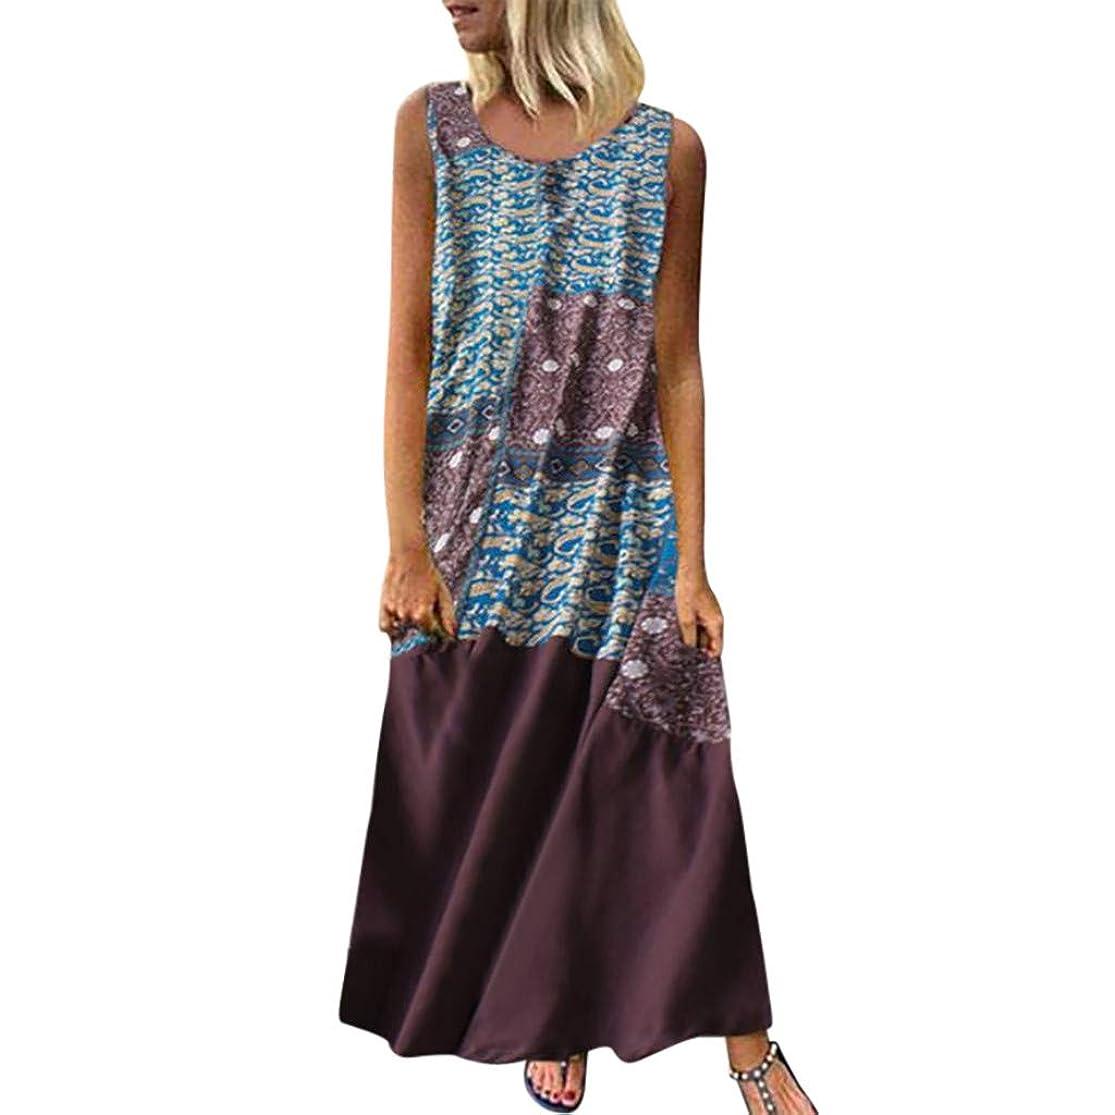 DondPo Women Vintage Bohemian Folk Dresses Summer V-Neck Boho Sleeveless Floral Printed Plus Size Beach Maxi Dress yhkyrkbz9